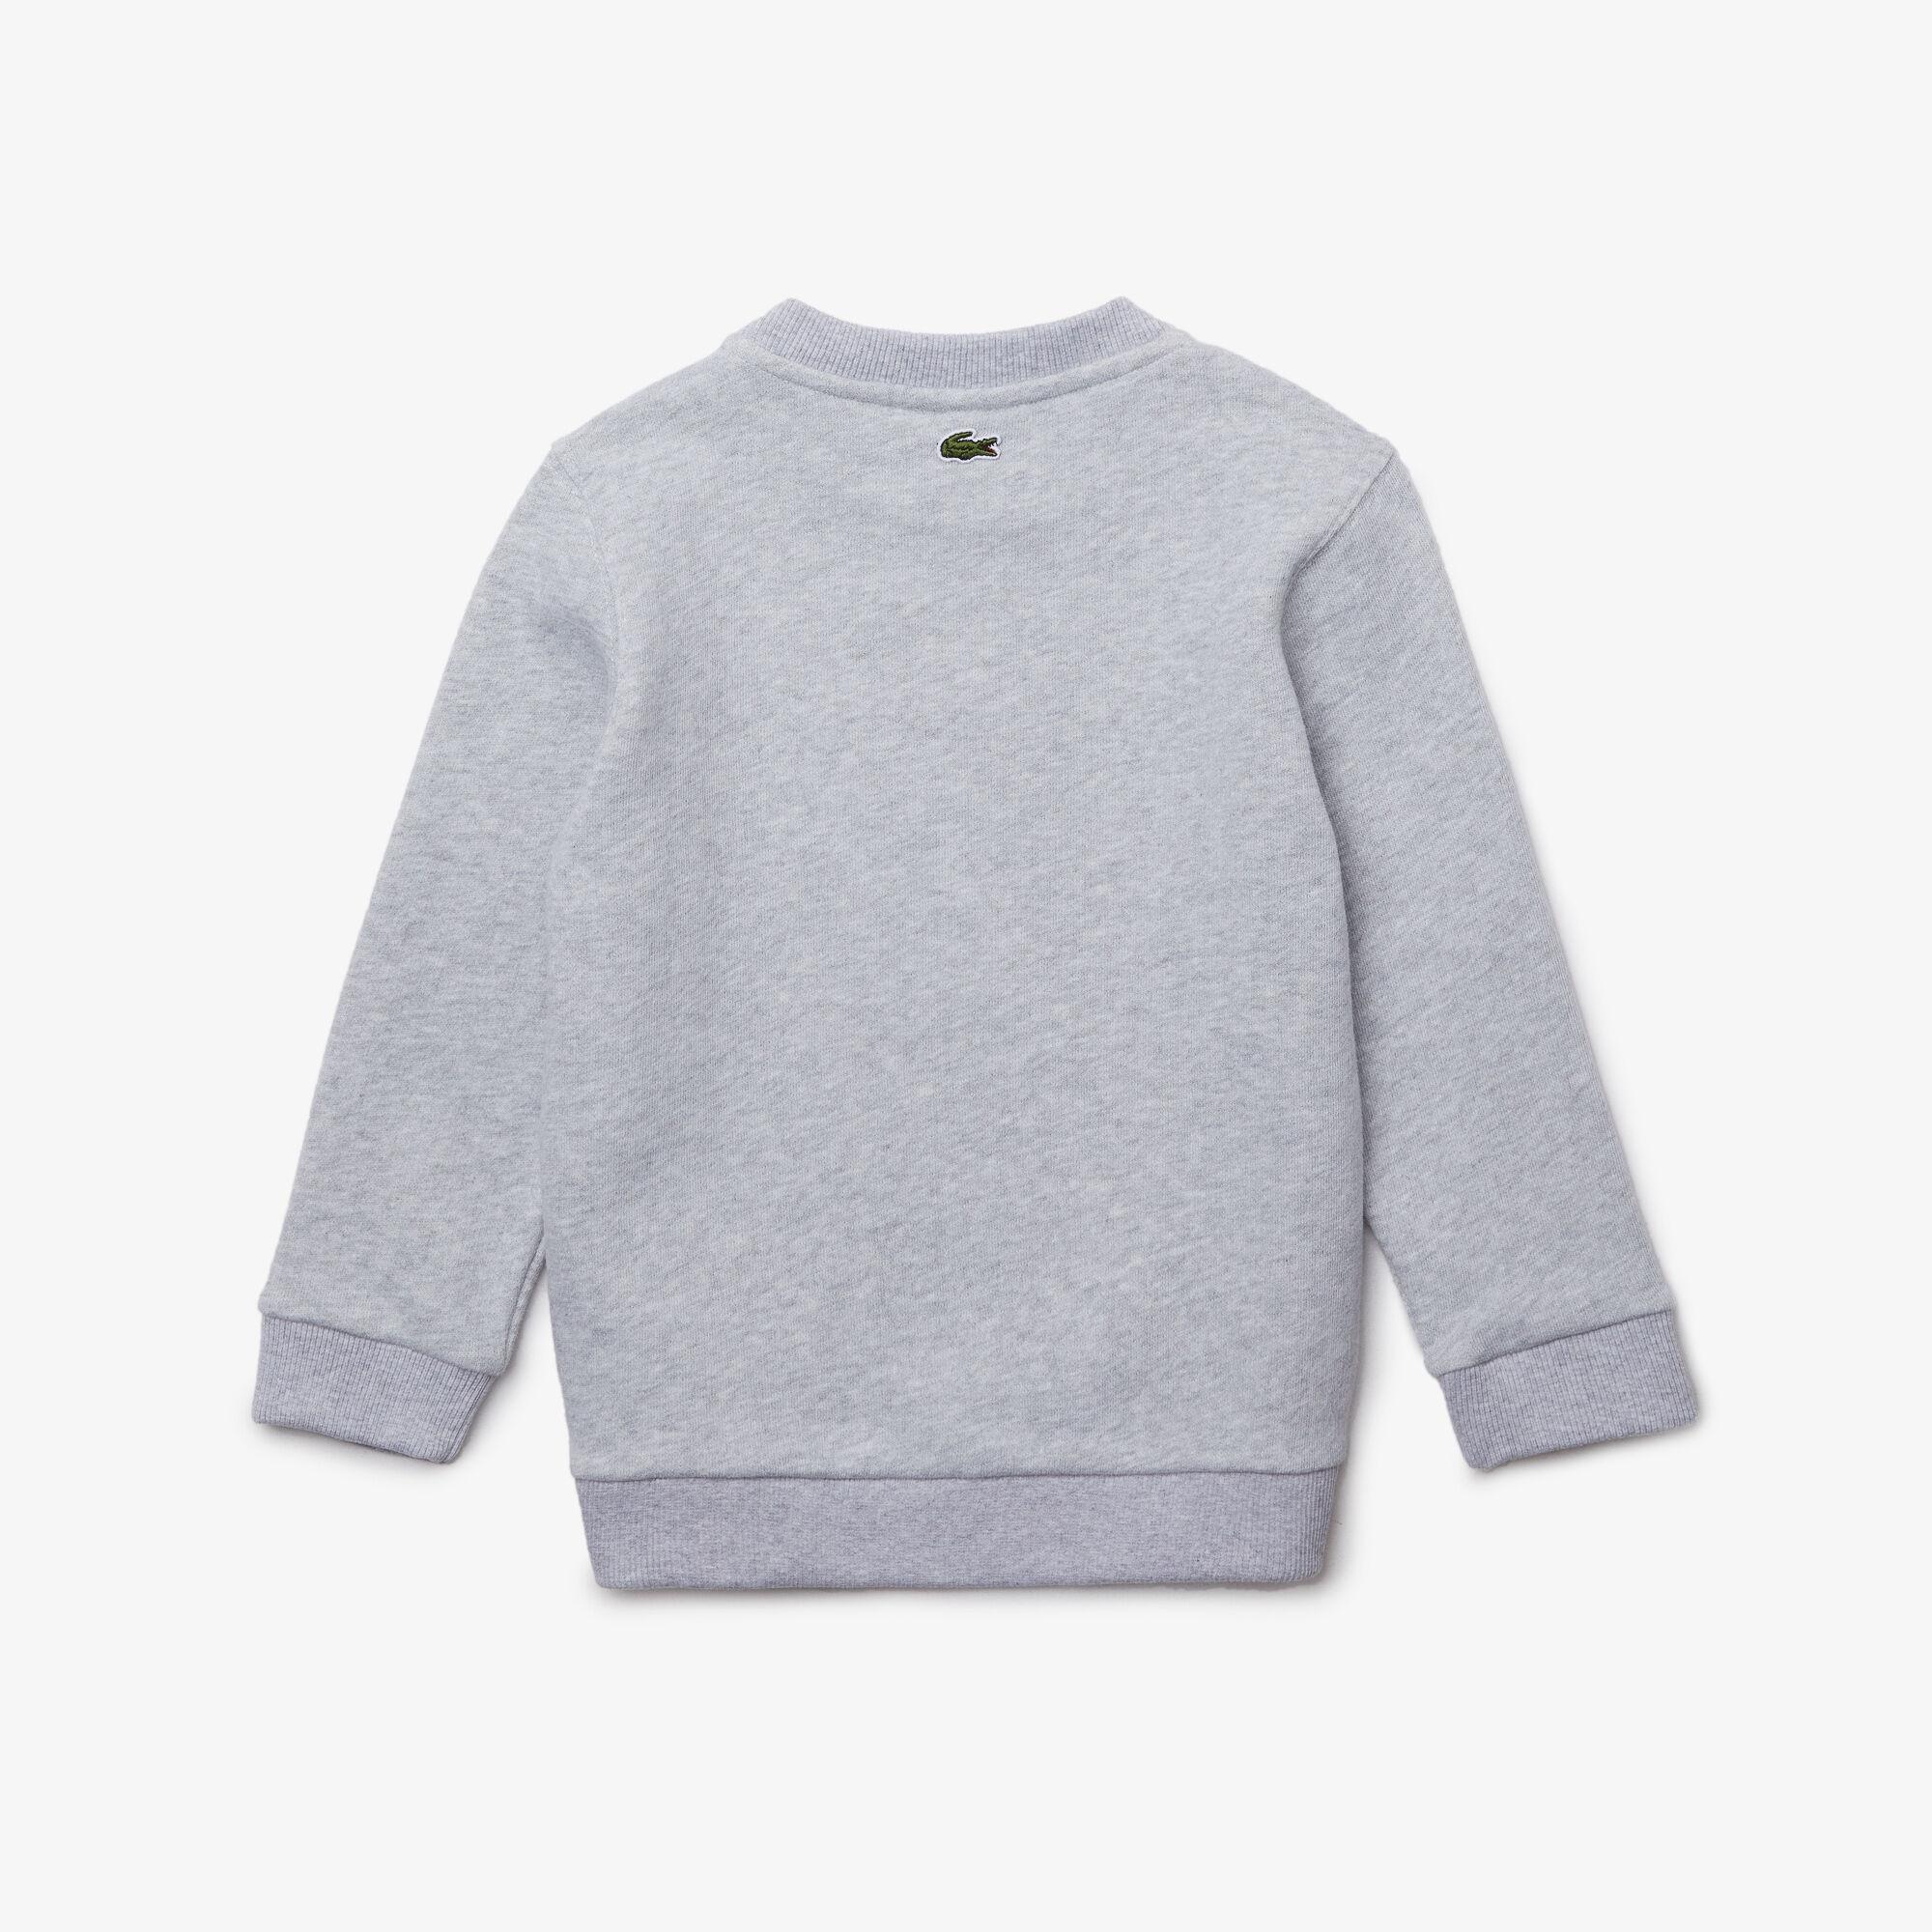 Boys' Crew Neck Fun Crocodile Design Cotton Sweatshirt